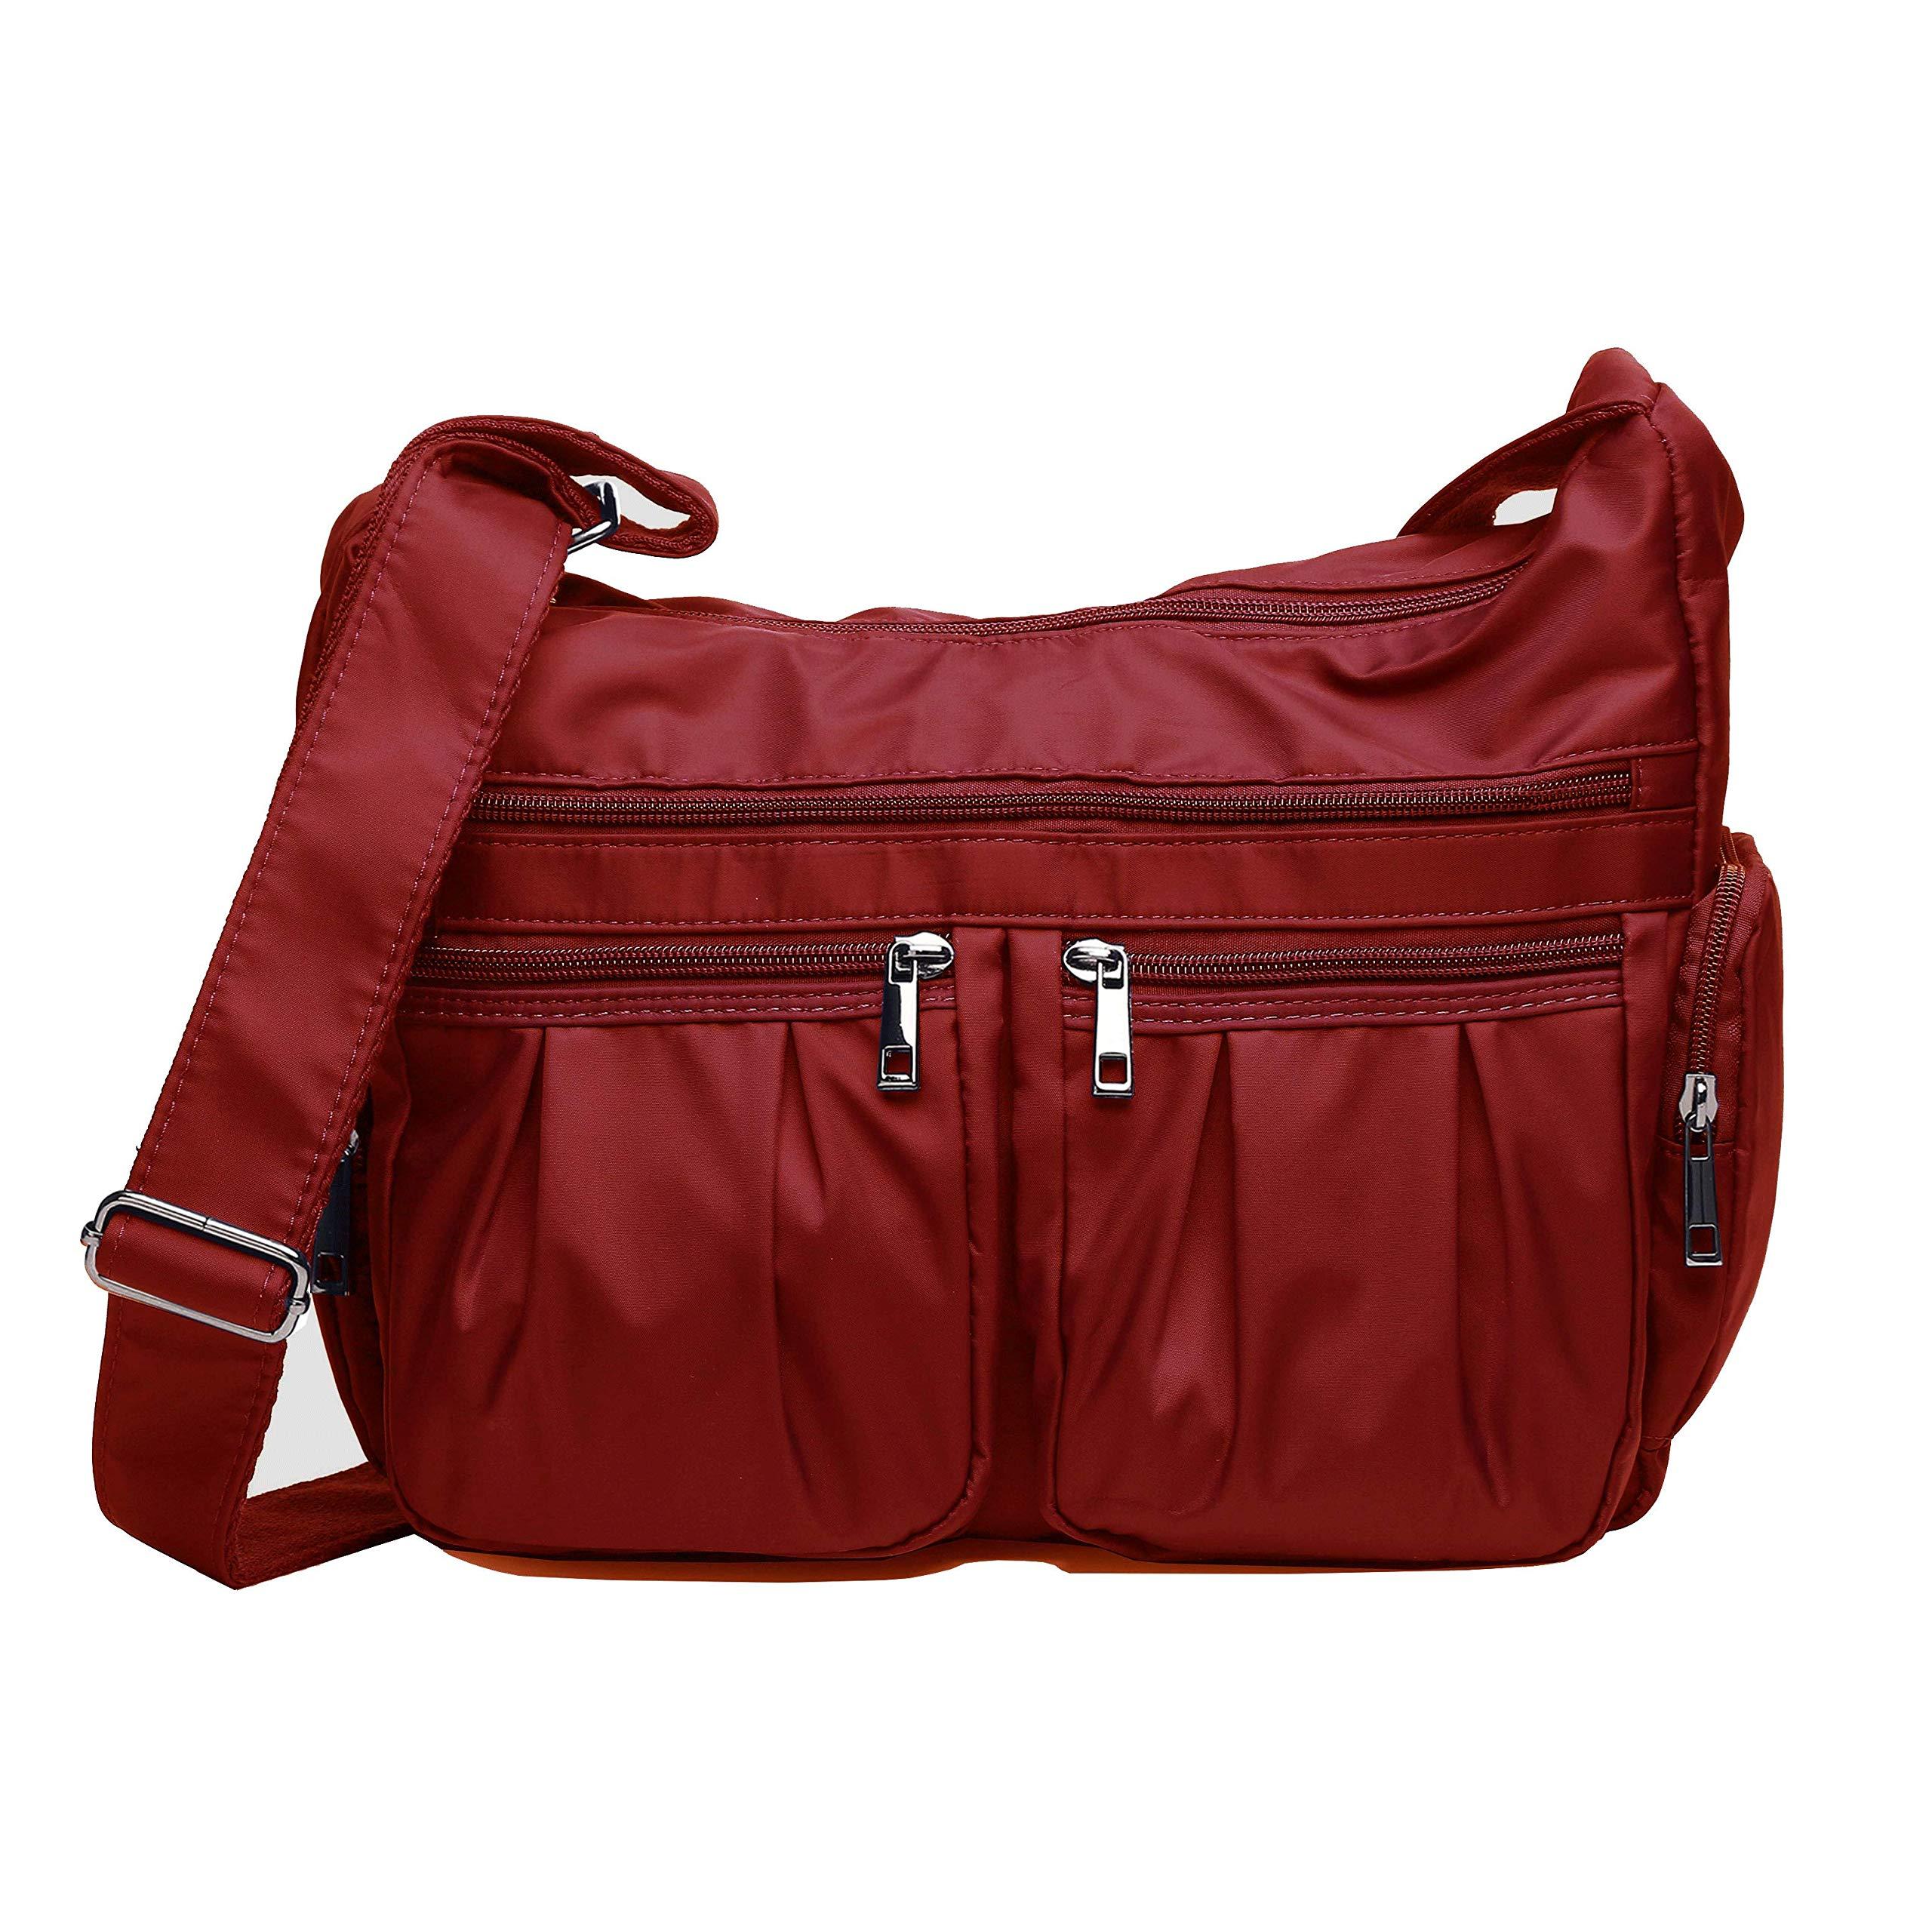 Crossbody Bags for Women, Multi Pocket Shoulder Bag Waterproof Nylon Travel Purses and Handbags (8981_Red) by VOLGANIK ROCK (Image #1)